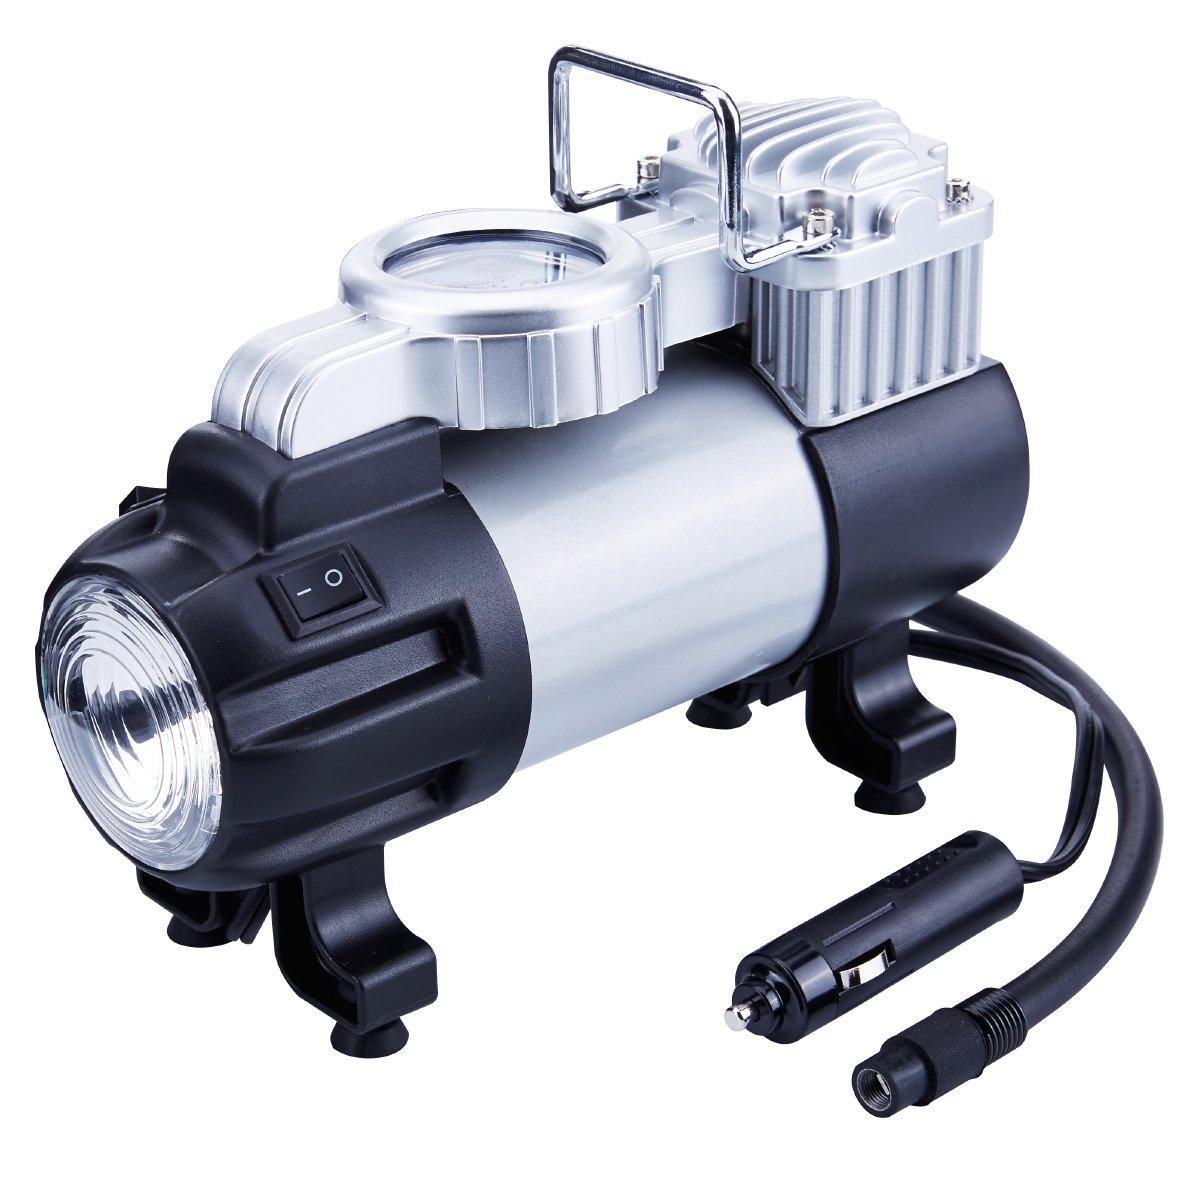 12 Volt Air Compressor Heavy Duty >> 12V Tire Inflator, Portable Air Compressor, Heavy Duty Direct Drive Pump 150PSI | eBay